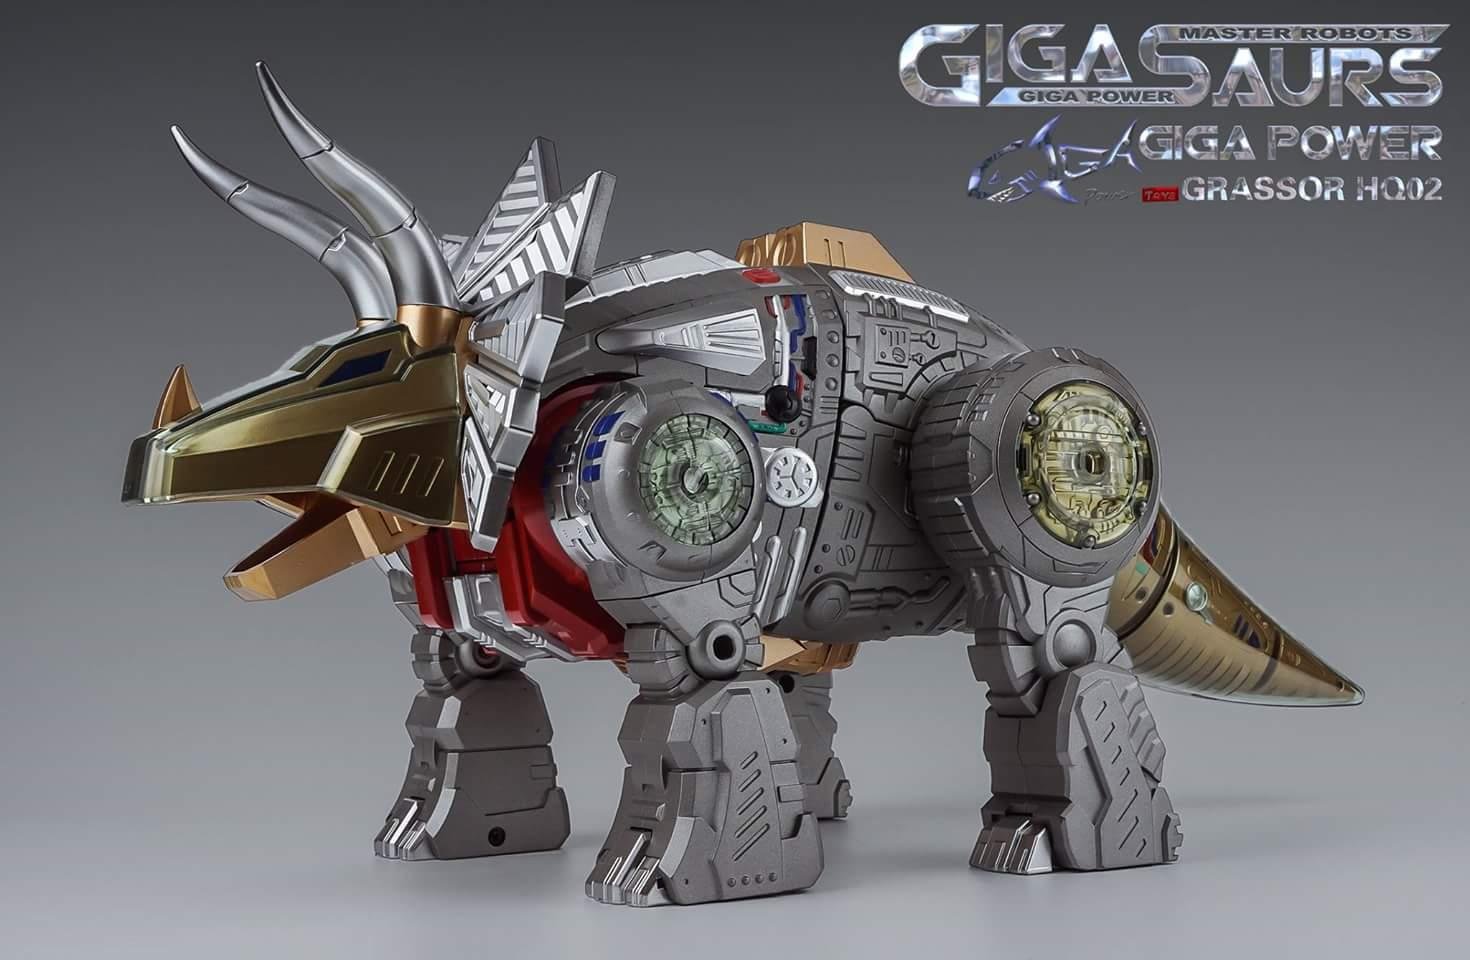 [GigaPower] Produit Tiers - Jouets HQ-01 Superator + HQ-02 Grassor + HQ-03 Guttur + HQ-04 Graviter + HQ-05 Gaudenter - aka Dinobots - Page 5 LpYIVhkt